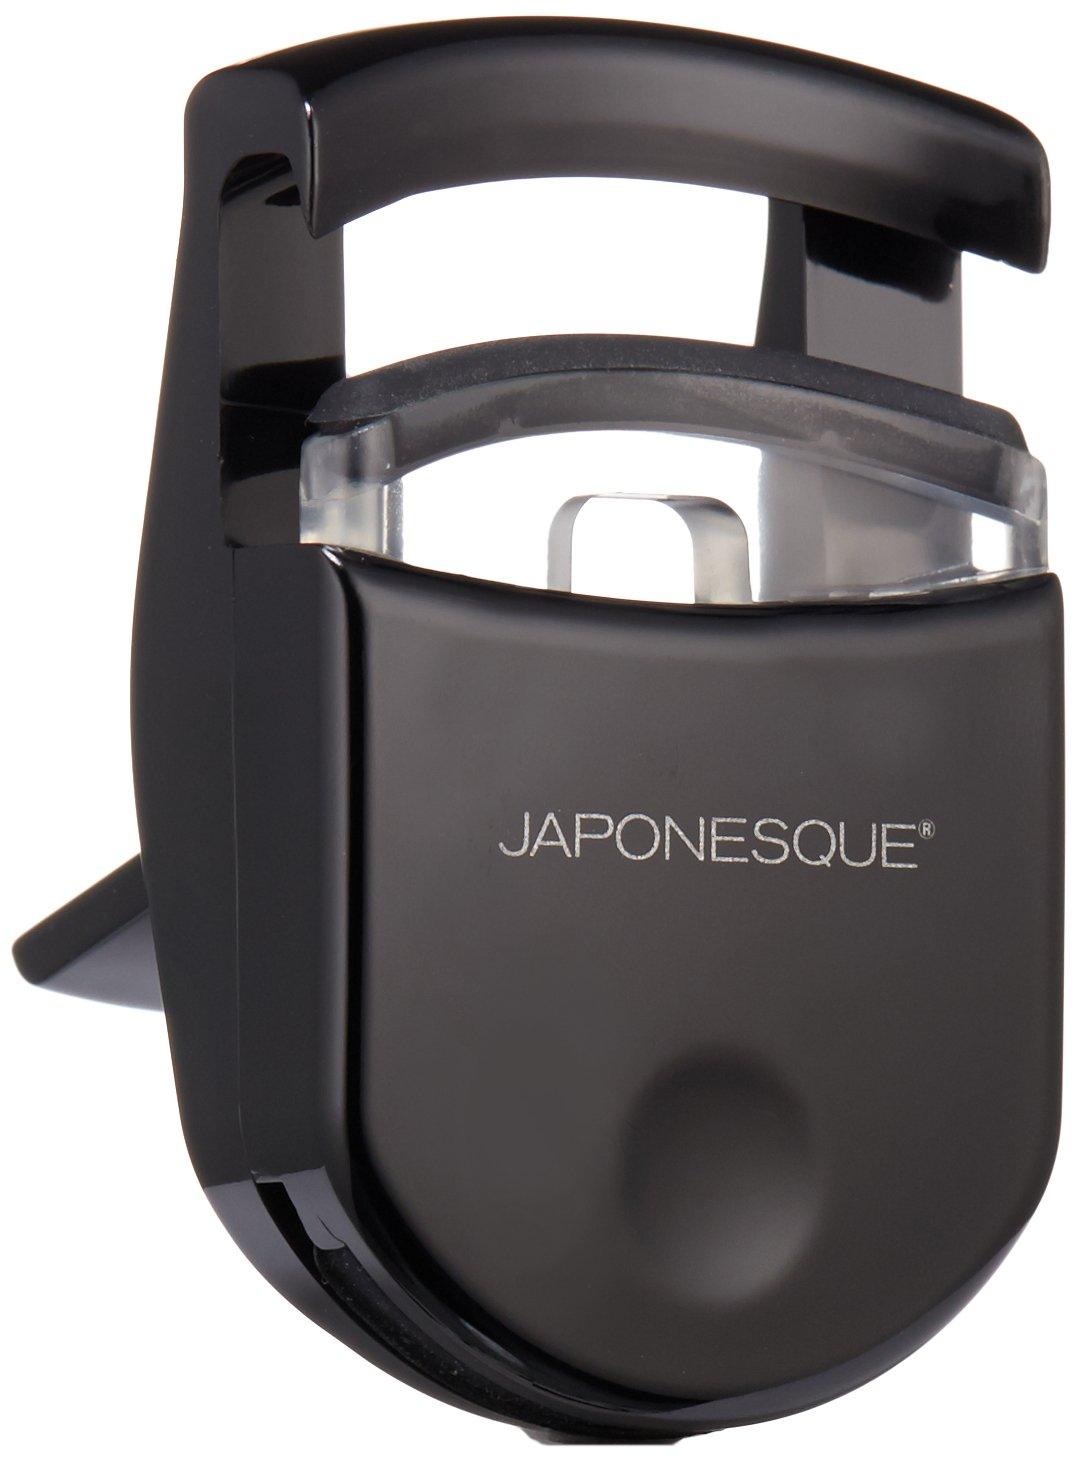 Go Curl Japonesque Eyelash Curler